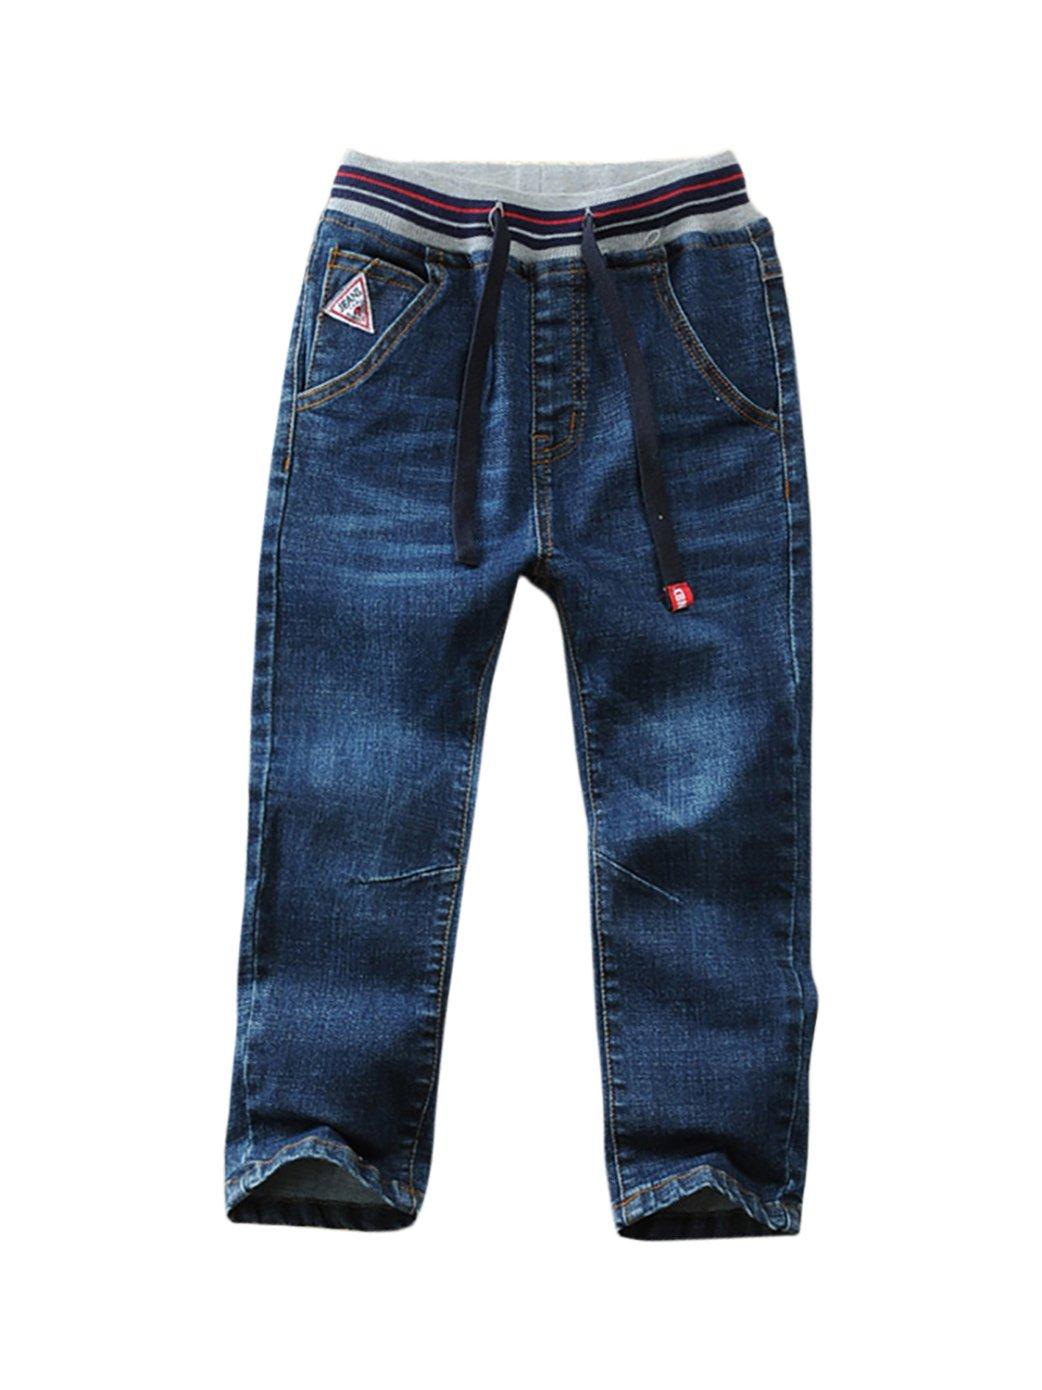 LISUEYNE Baby Boy Summer Spring Casual Blue Jean Long Holey Ripped Basic Jeans Elastic Band Denim Long Jeans For Boys